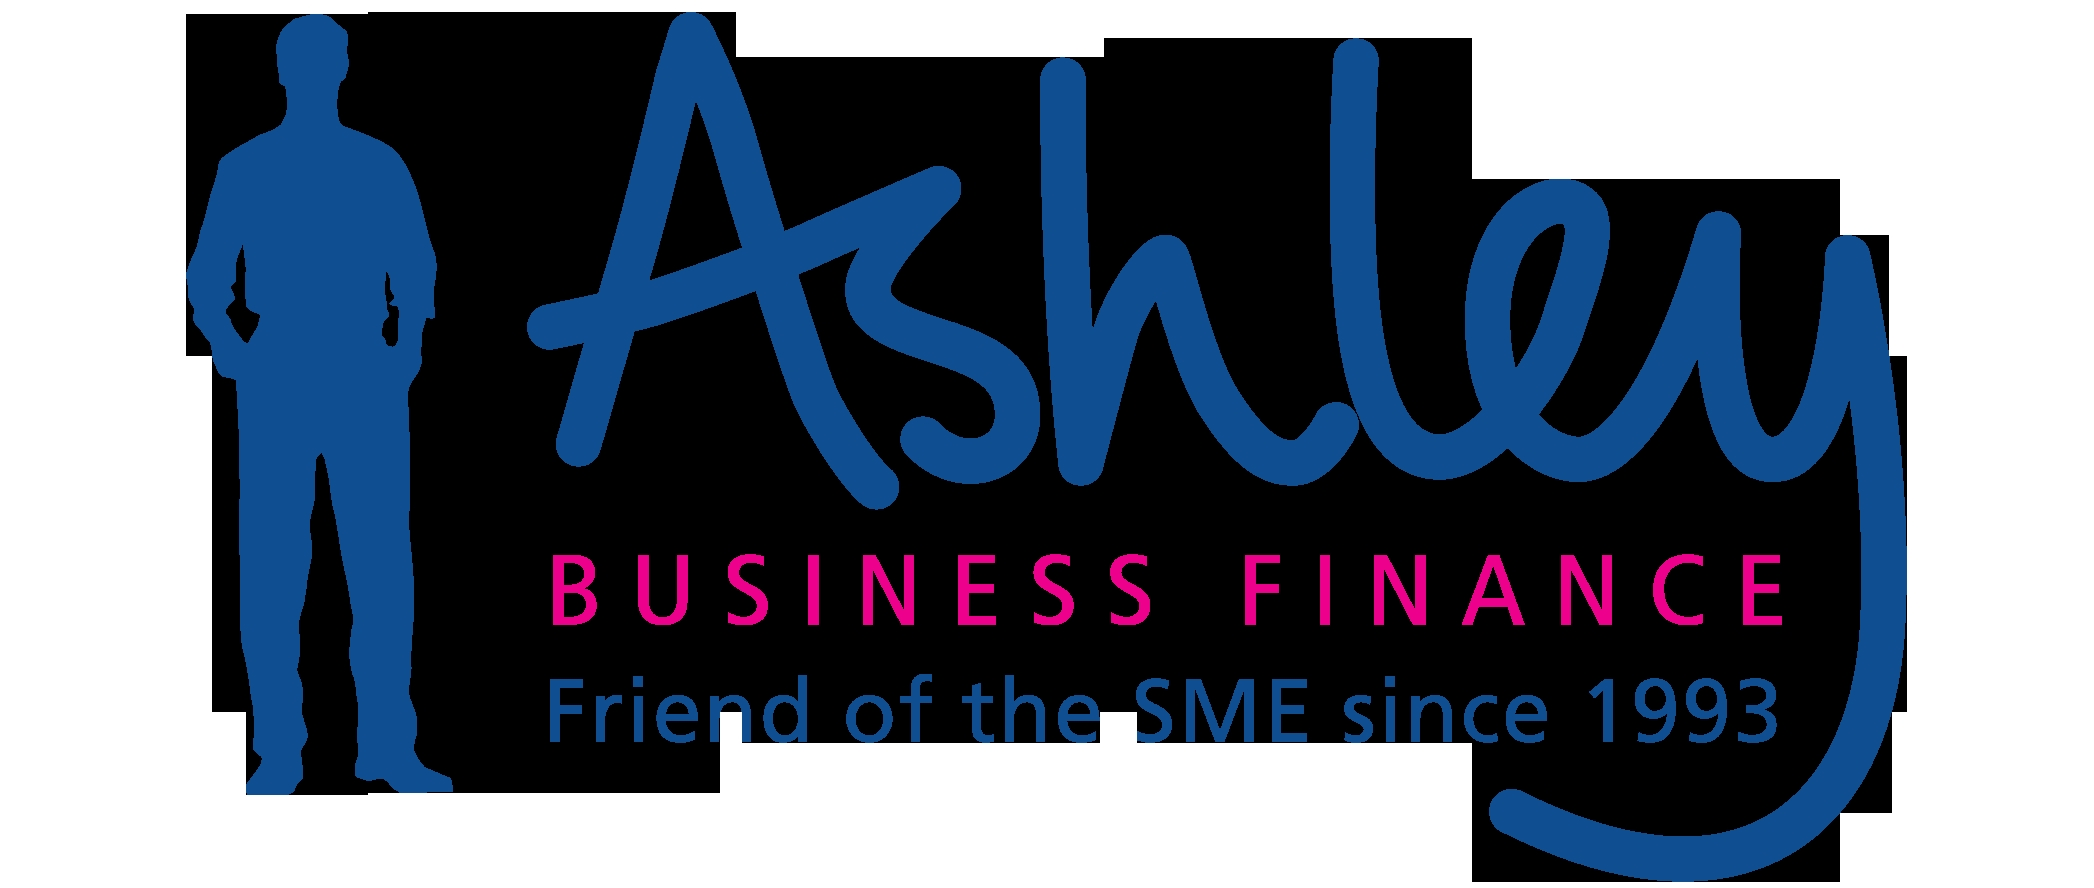 hsbc invoice finance login list of members and associates 2094 X 888